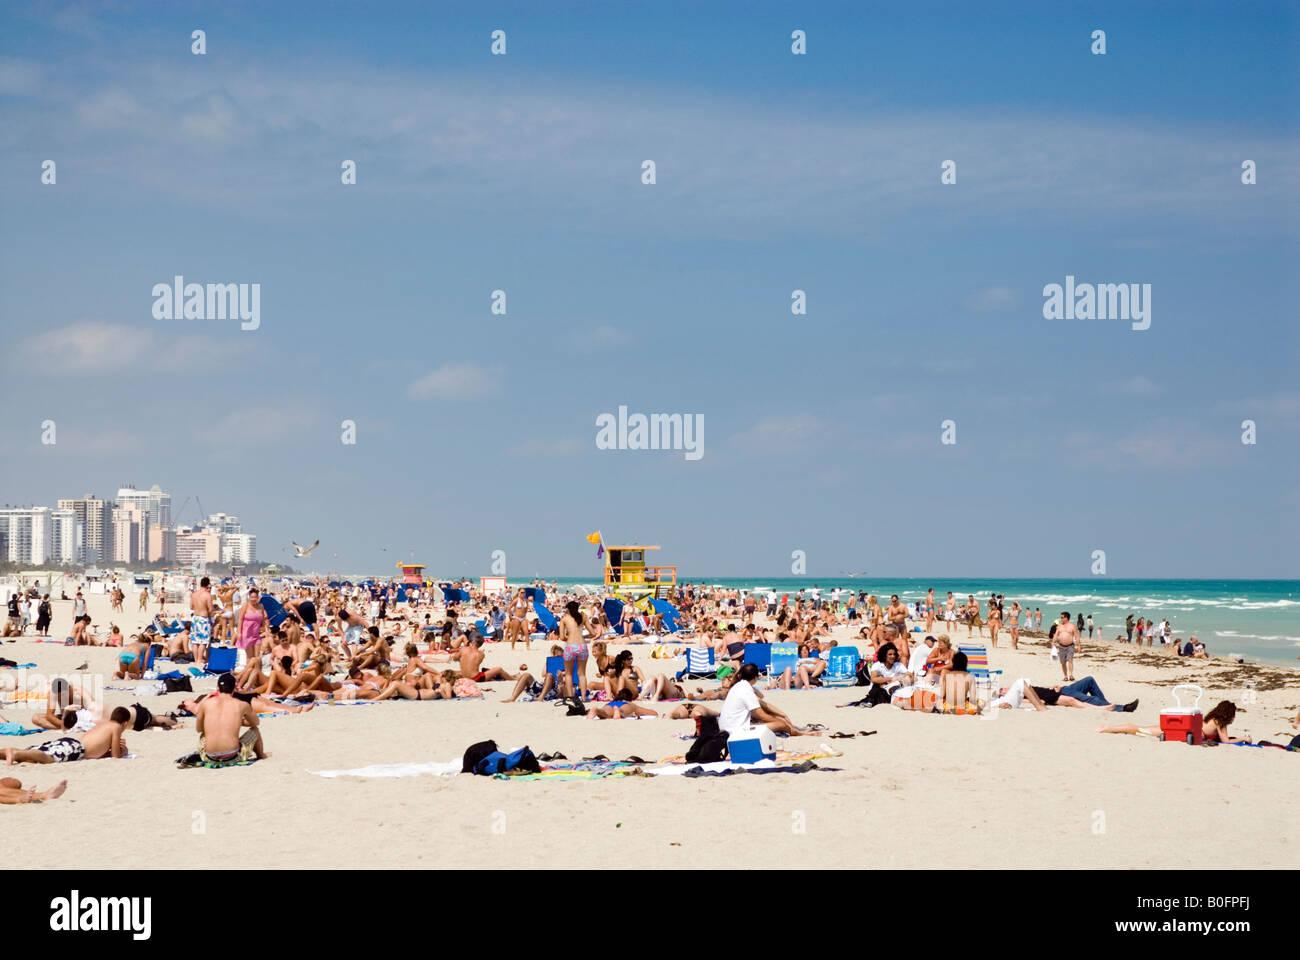 South Beach Miami Florida USA - Stock Image